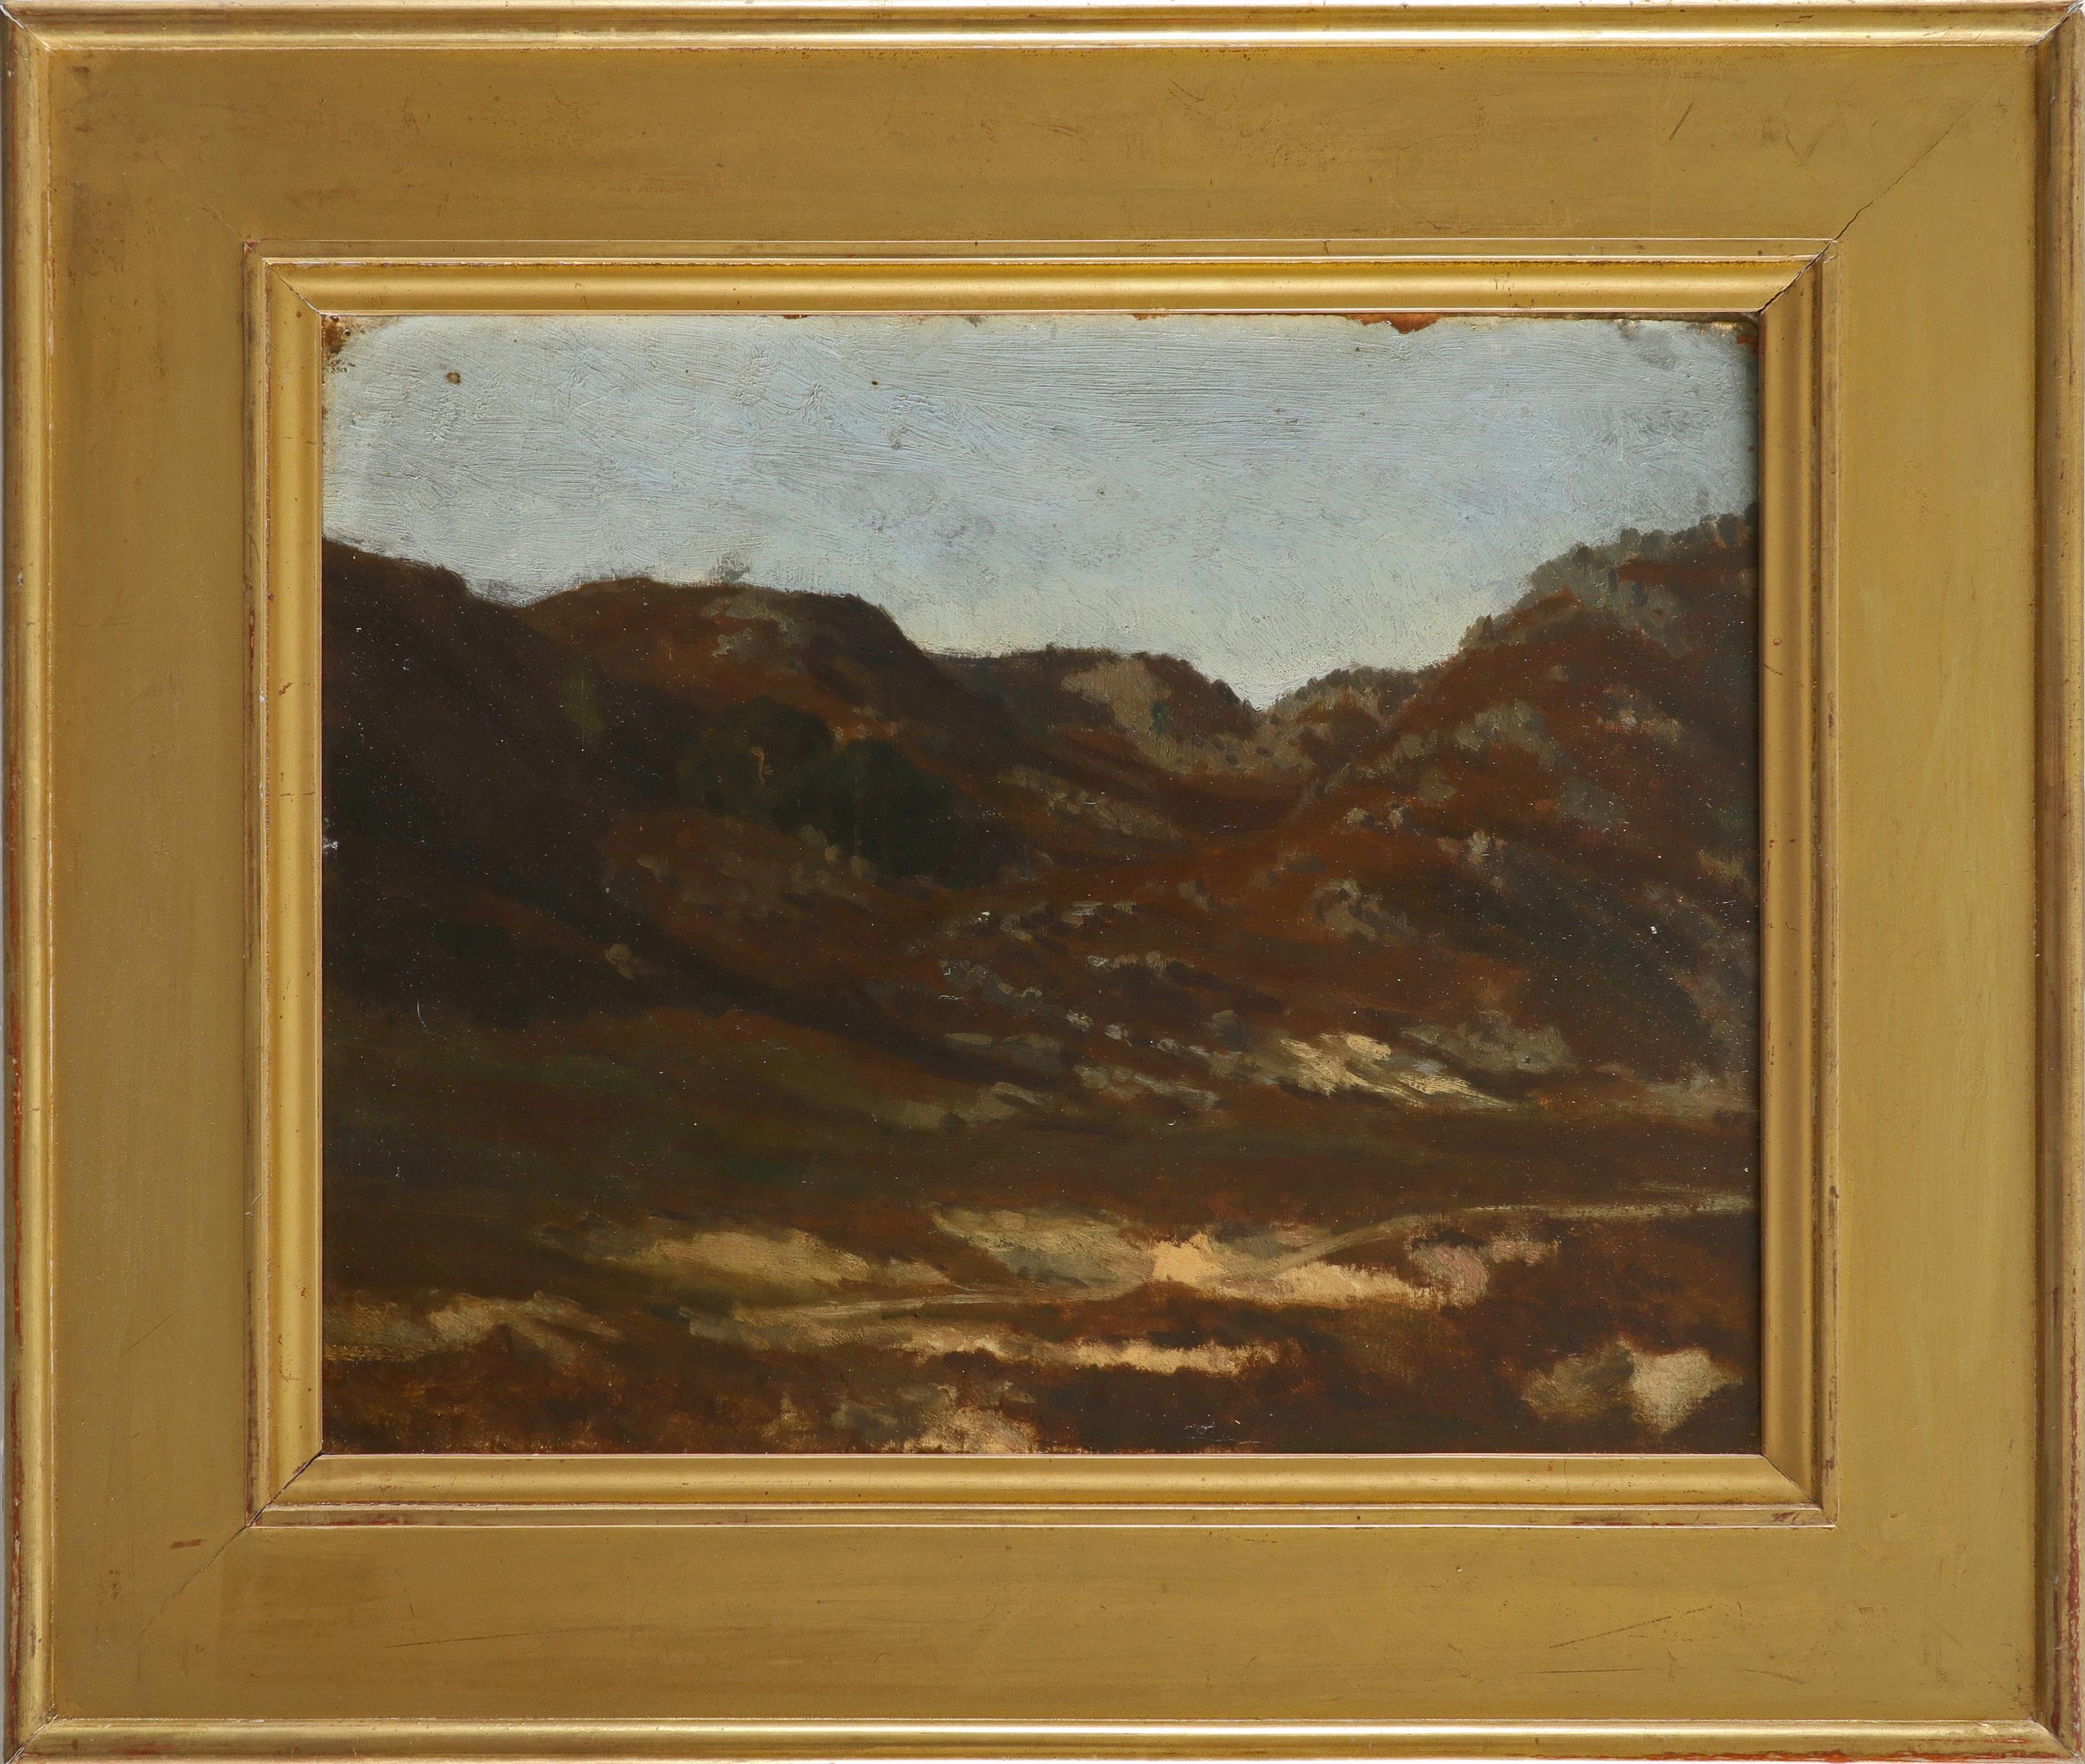 Auguste-Paul-Charles Anastasi (French 1820-1889) Gorges d'Apremont avant les Pins Fontainbleu - Image 2 of 3